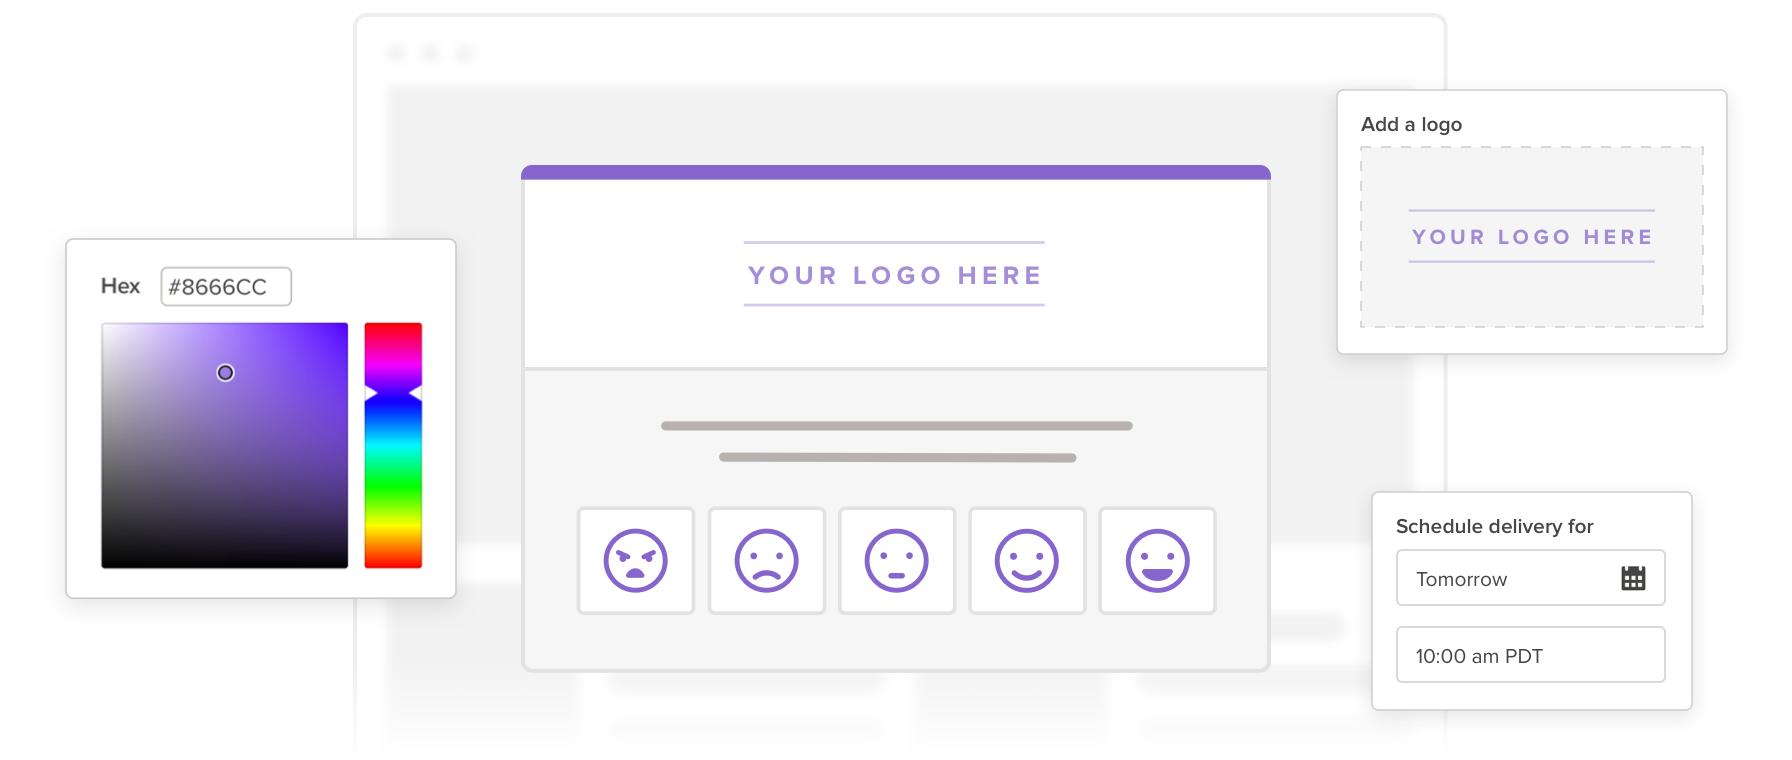 customer survey template hero image